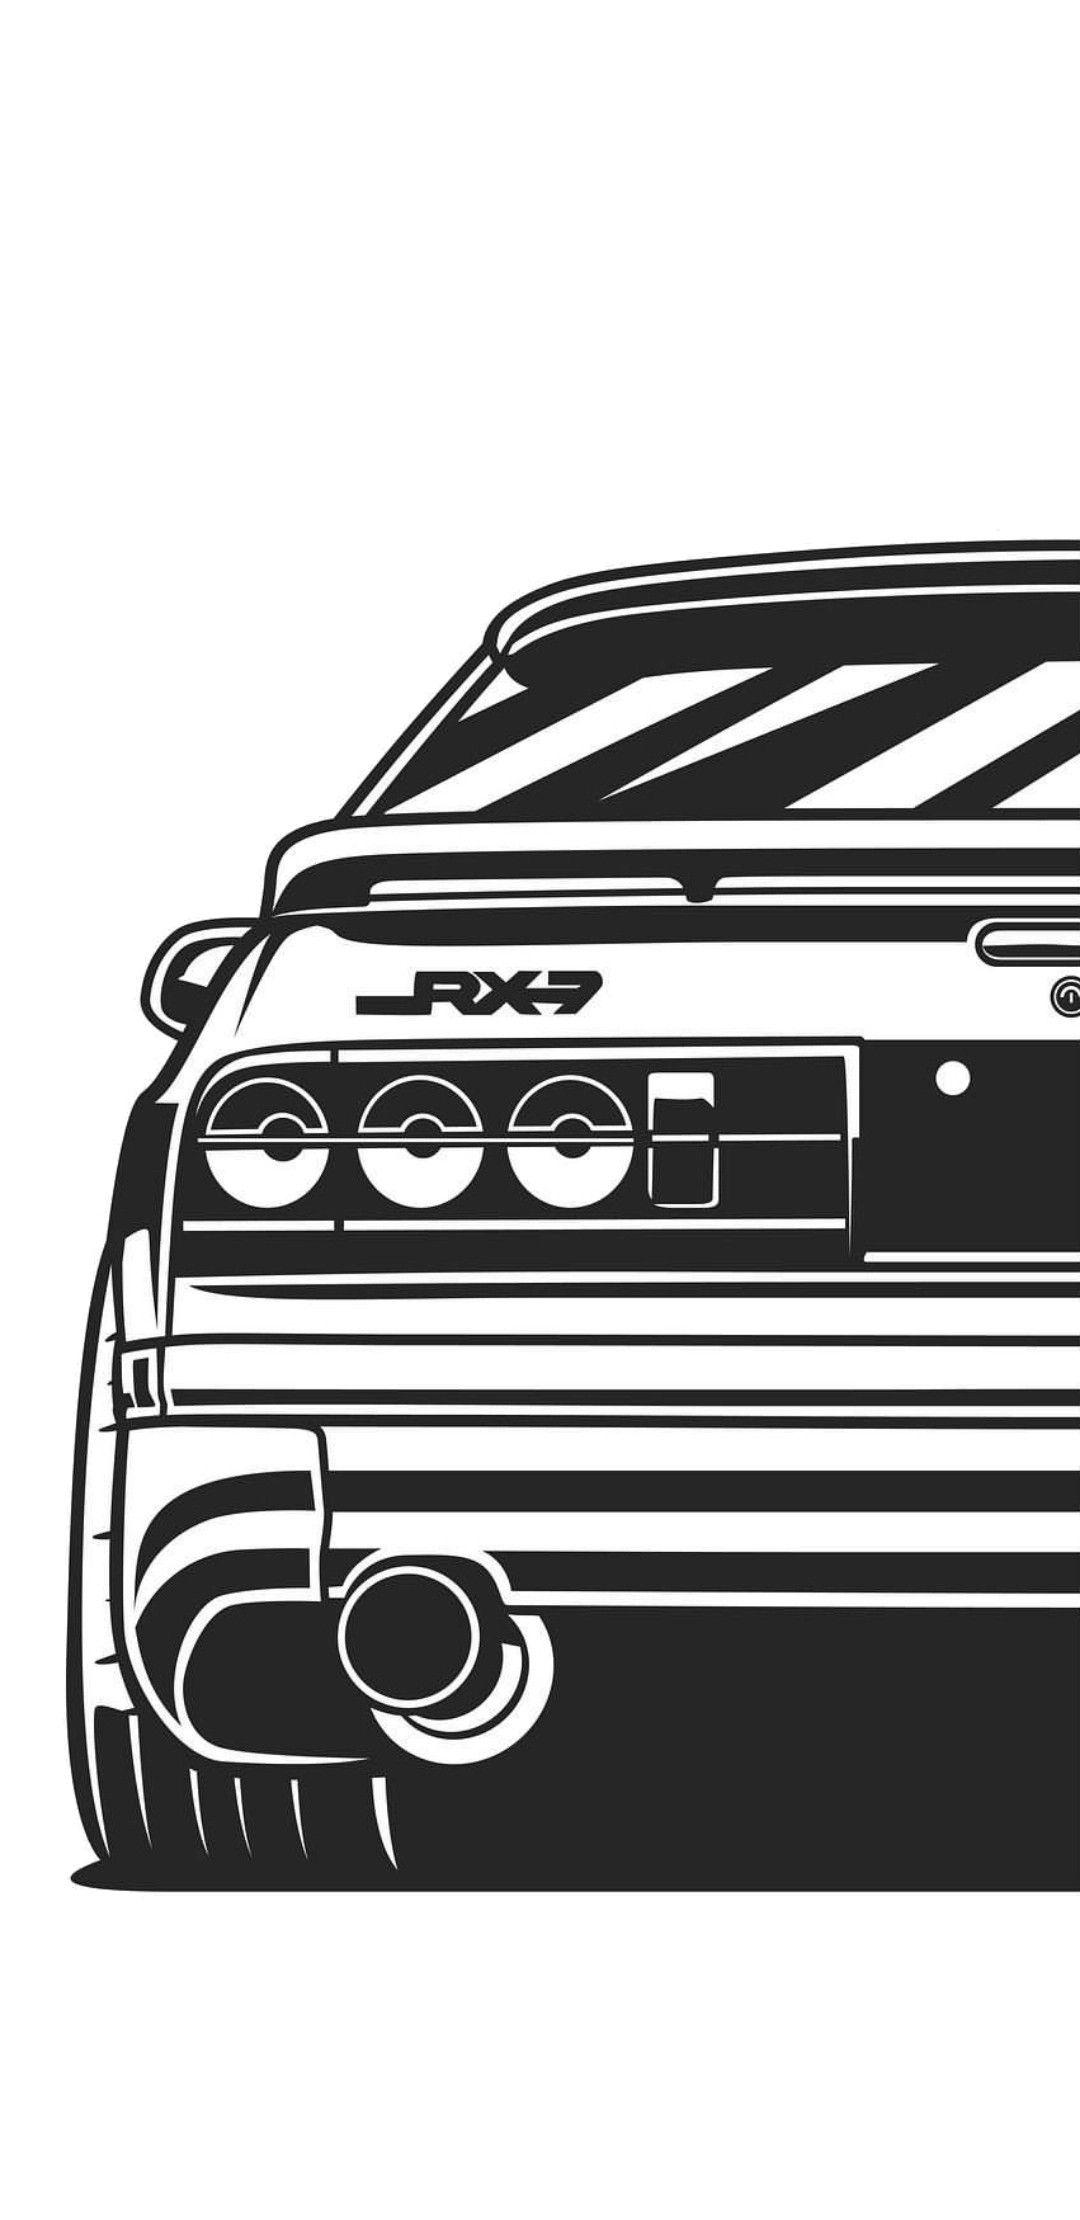 Pin By Montaser Mughrabi On Graphic Design Illustration Art Cars Race Car Coloring Pages Car Artwork